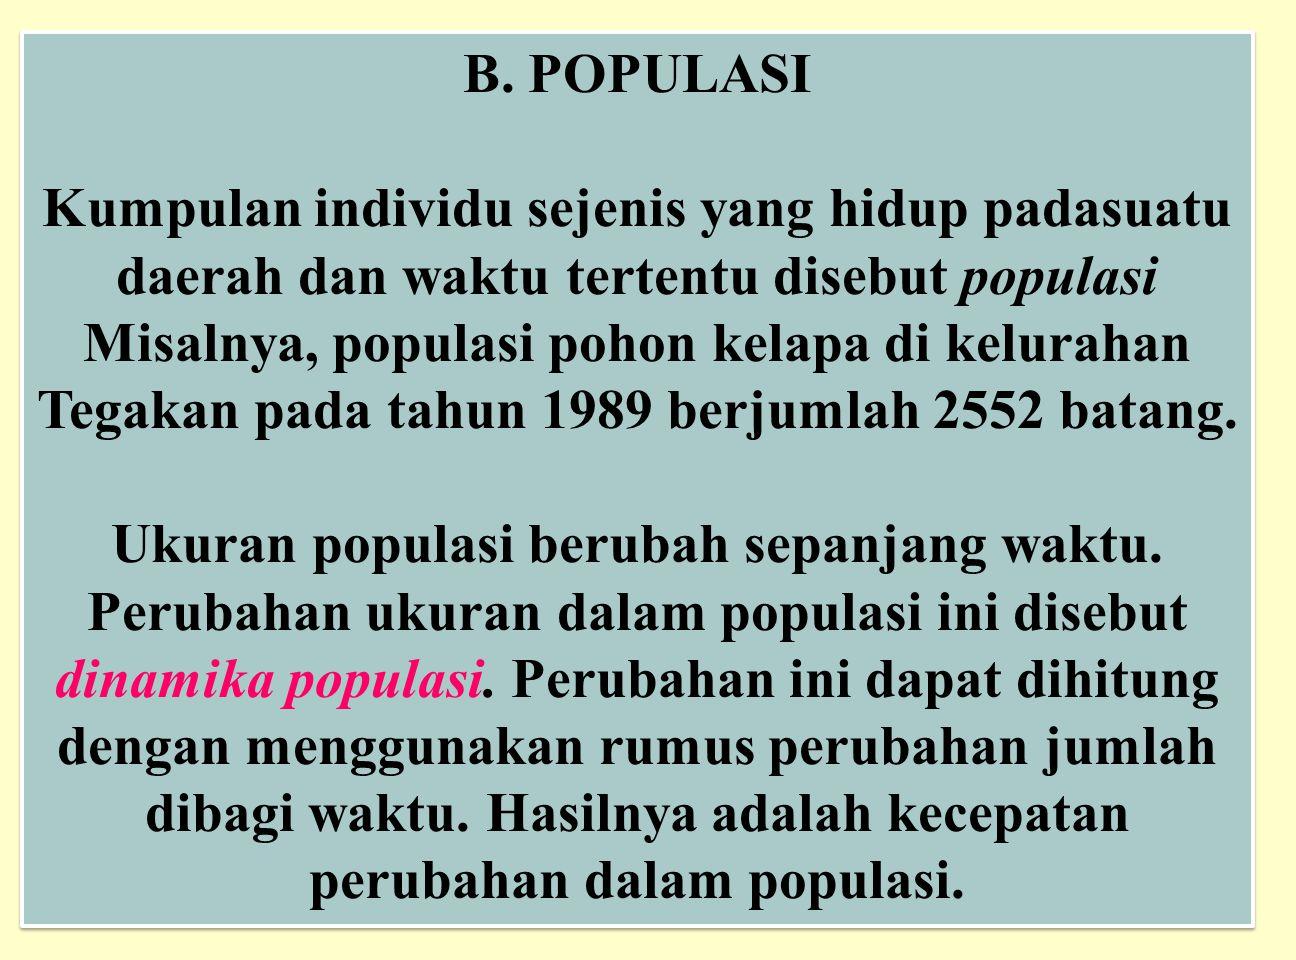 B. POPULASI